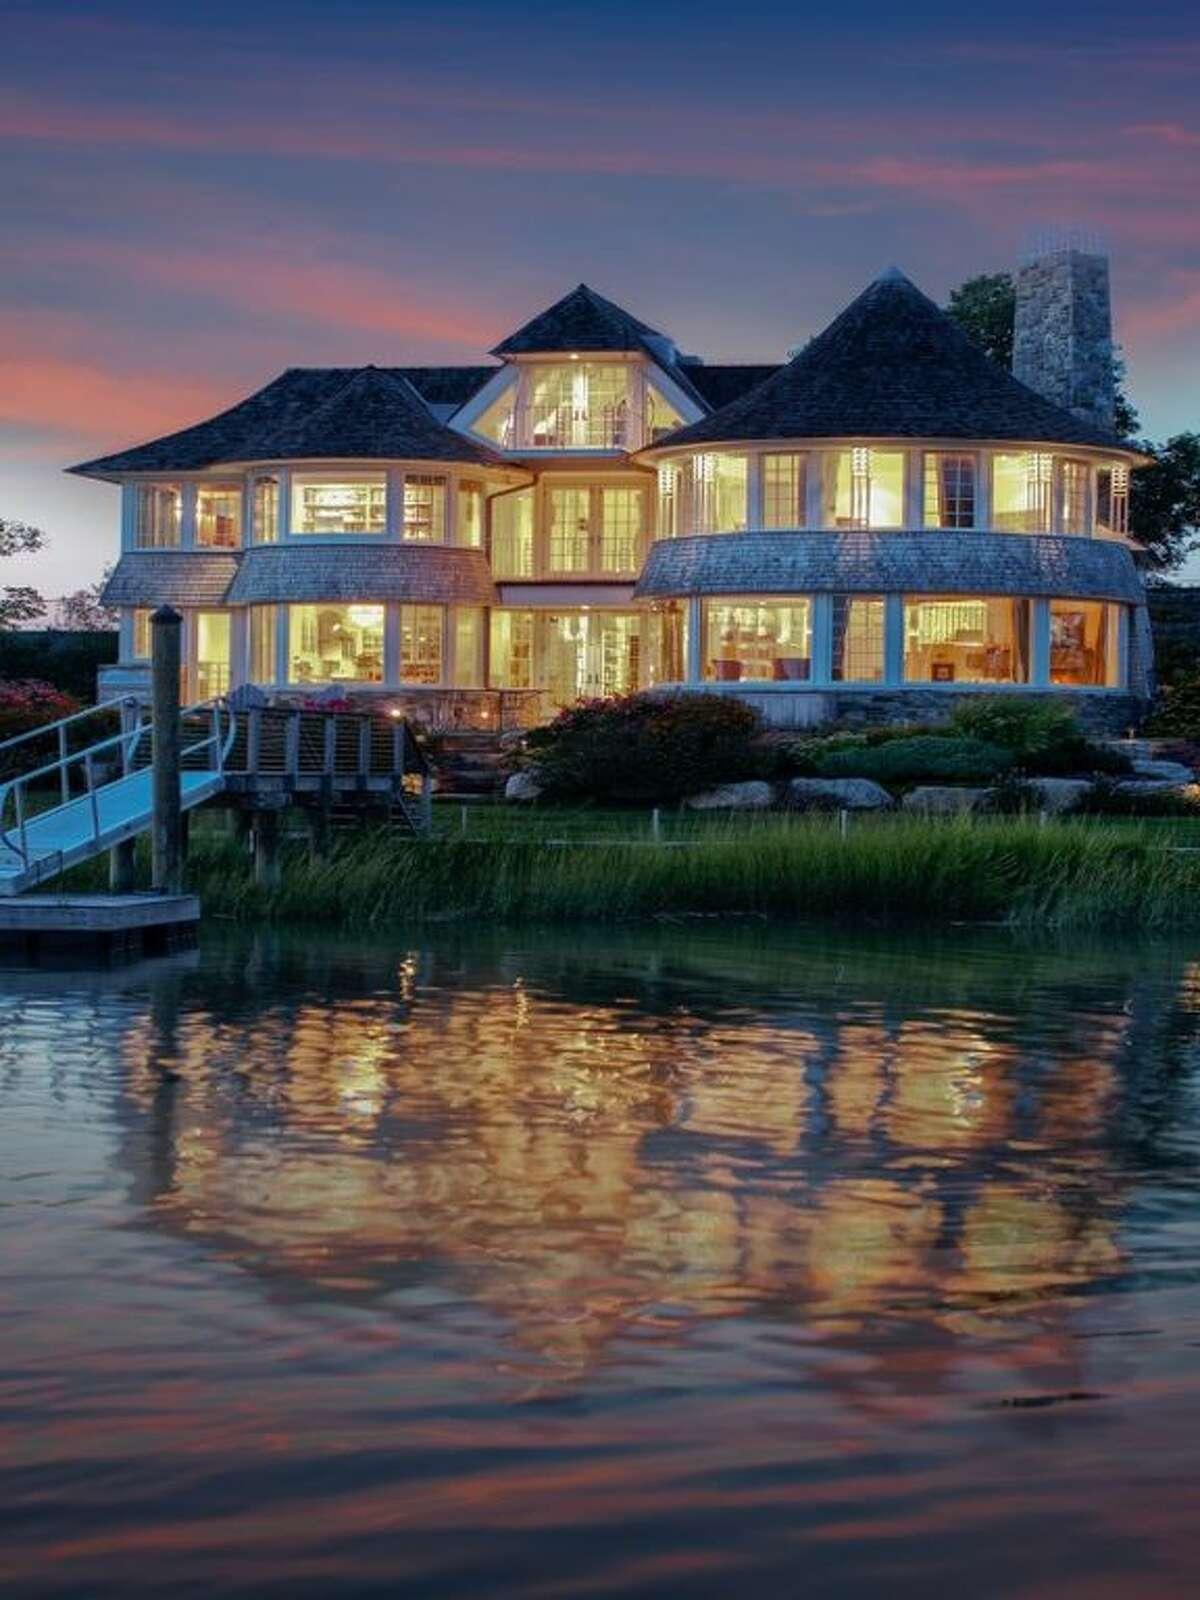 06870 - Old Greenwich, Conn. Ranking: 65 of 100 Median Sale Price 2018:$1.67 million Source: PropertyShark